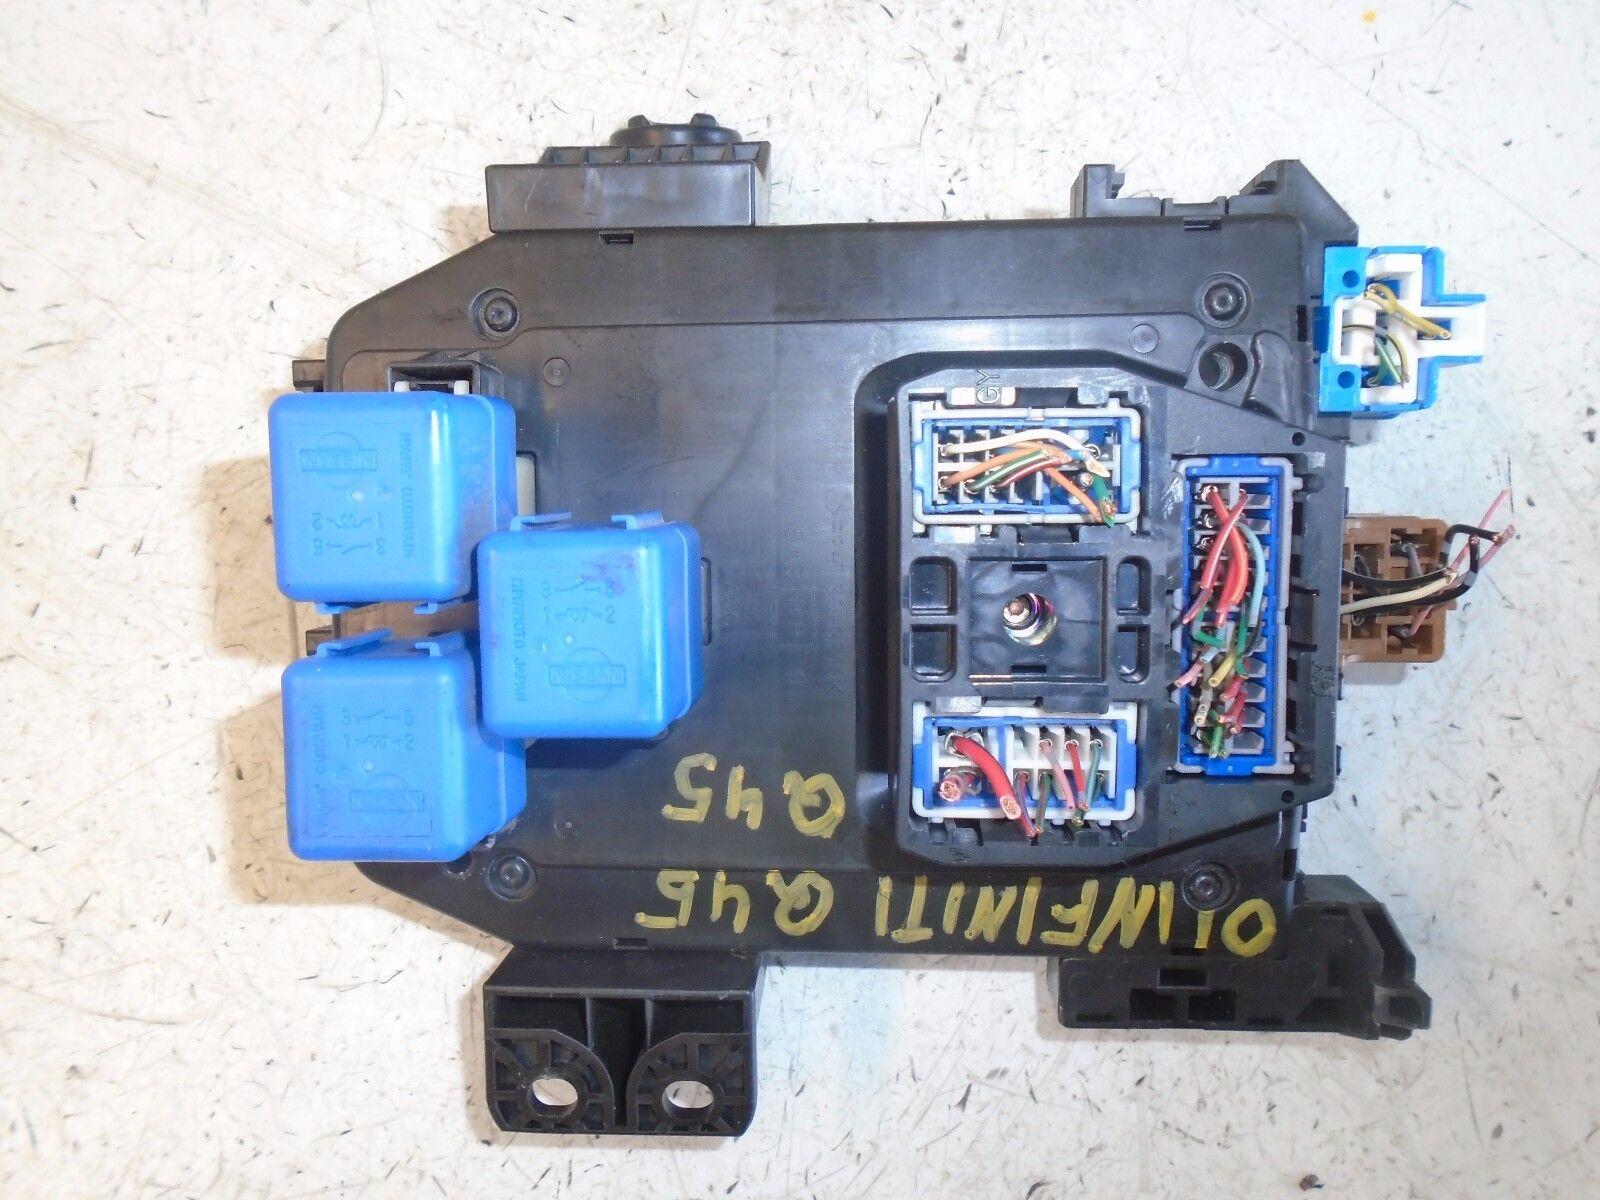 hight resolution of 92 infiniti q45 fuse box wiring diagrams lol92 infiniti q45 fuse box wiring library 1992 infiniti